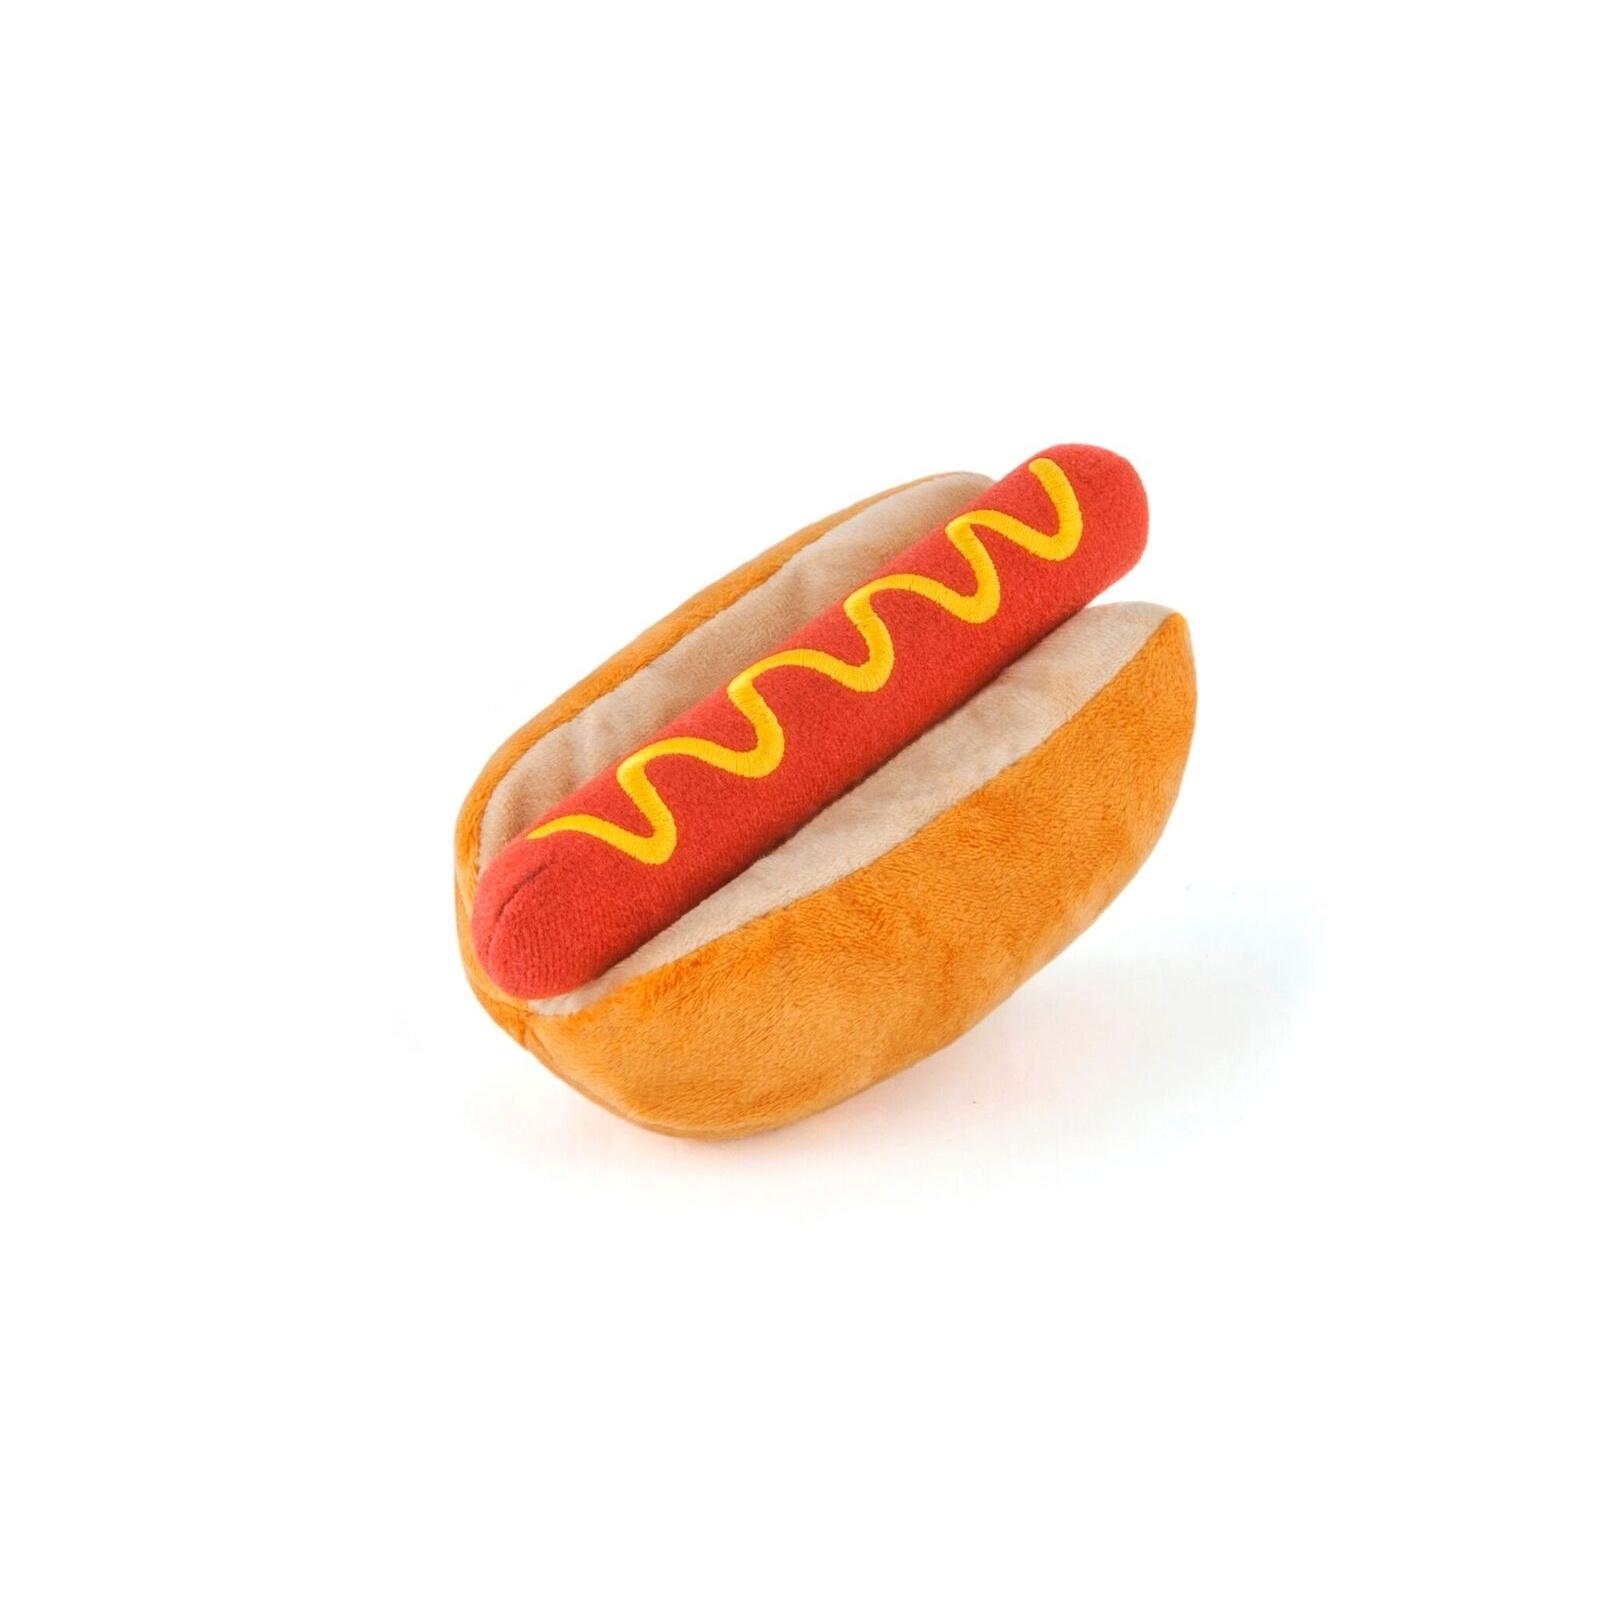 P.L.A.Y. American Classic Dog Toy - Hot Dog